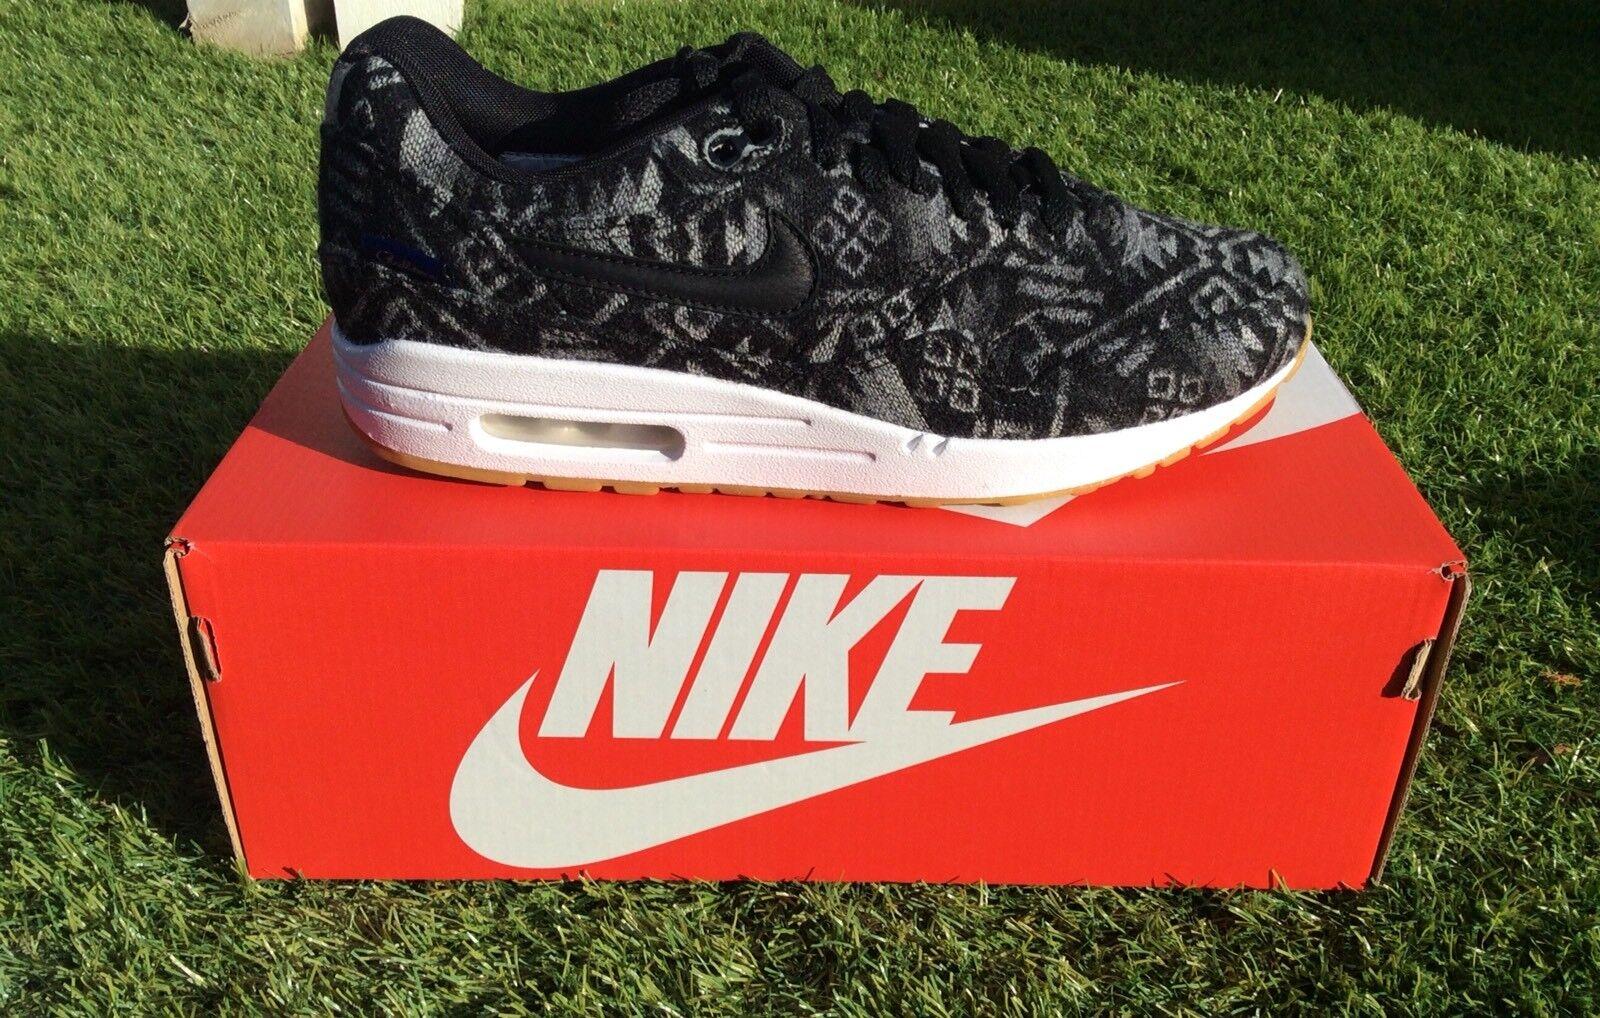 Nike AIR MAX 1 PRM Pendleton Sneaker EUR 41 GRIGIO NERO RARO